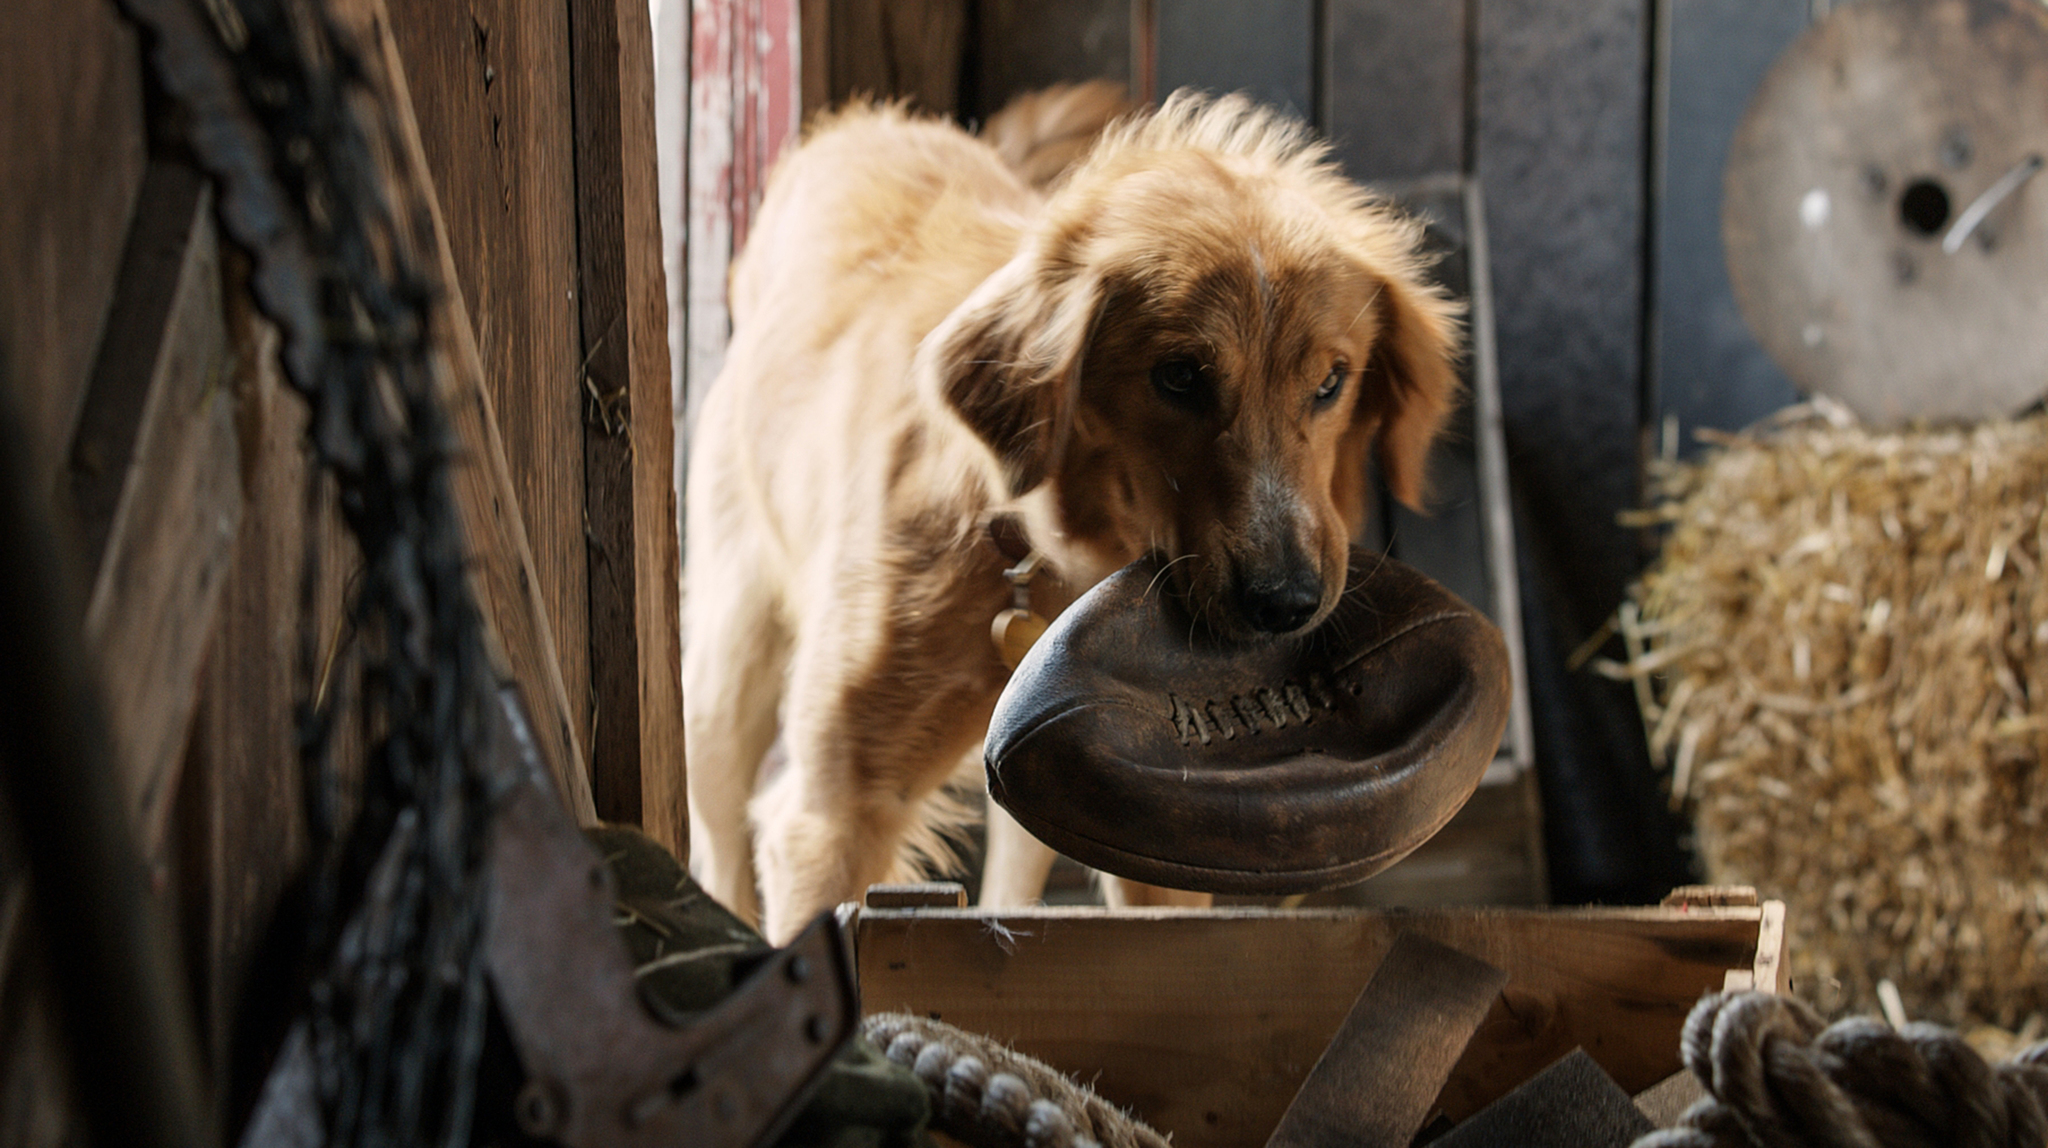 Josh Gad in A Dog's Purpose (2017)